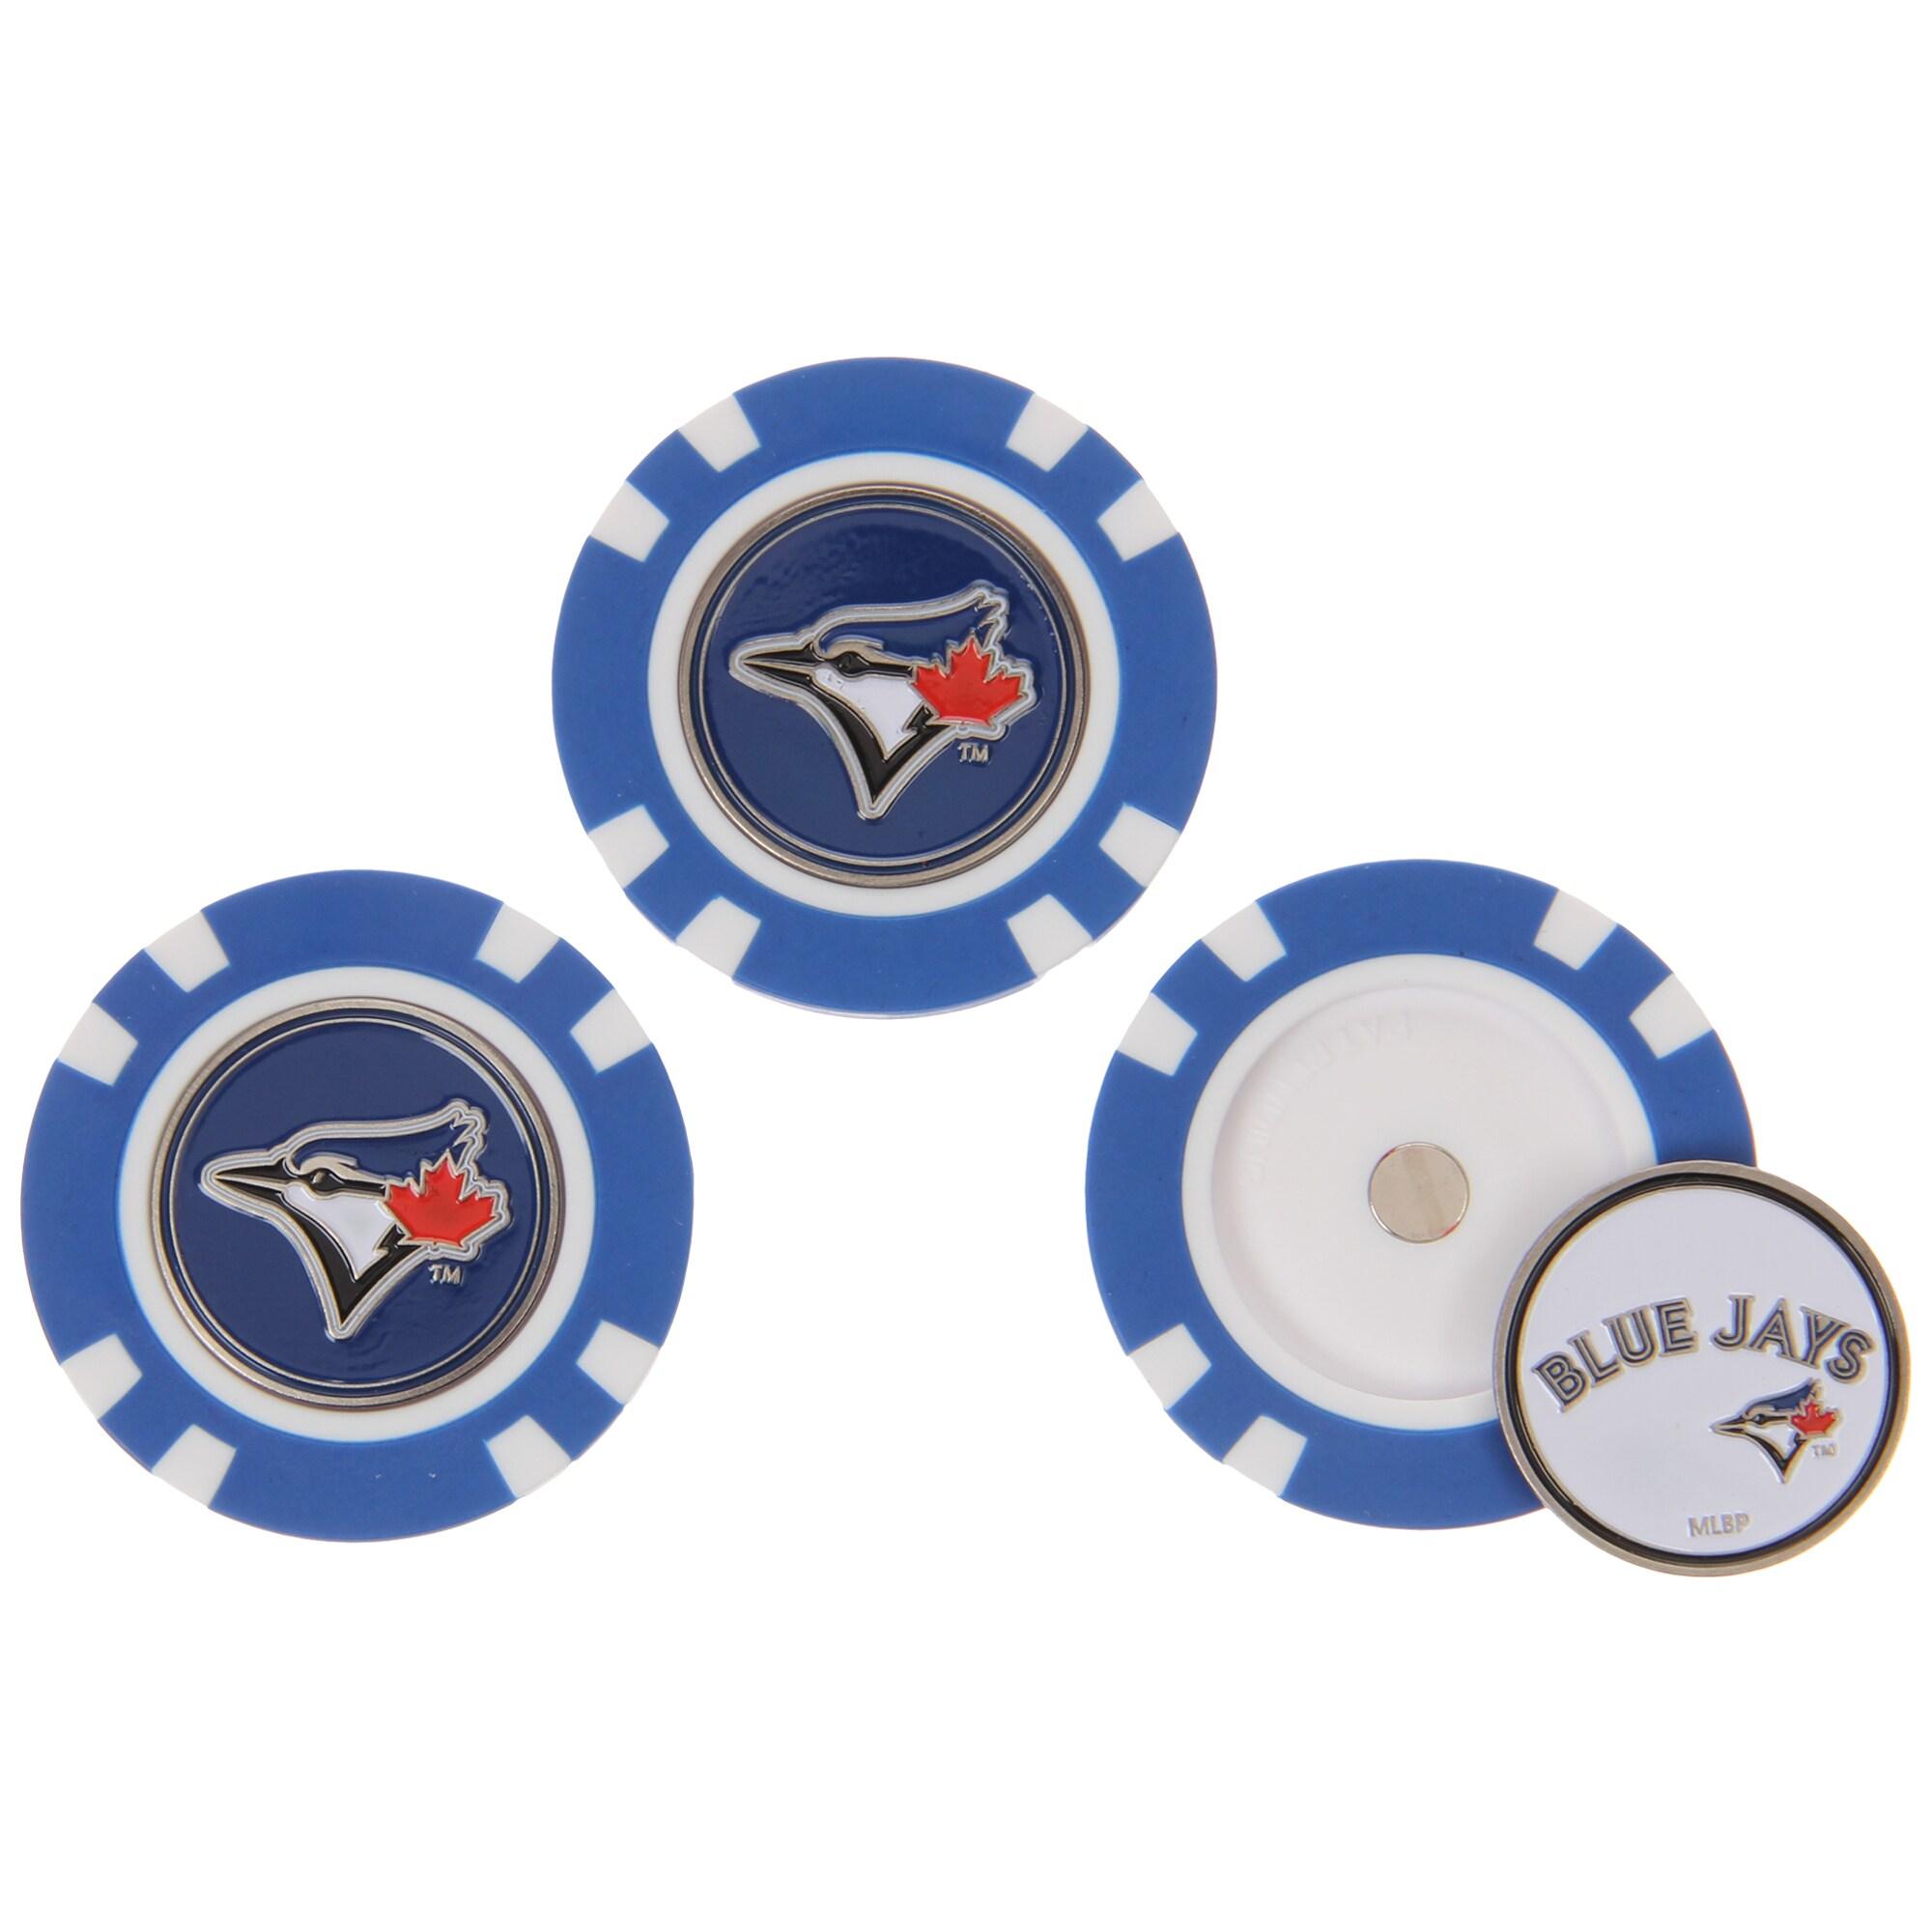 Toronto Blue Jays 3-Pack Poker Chip Golf Ball Markers